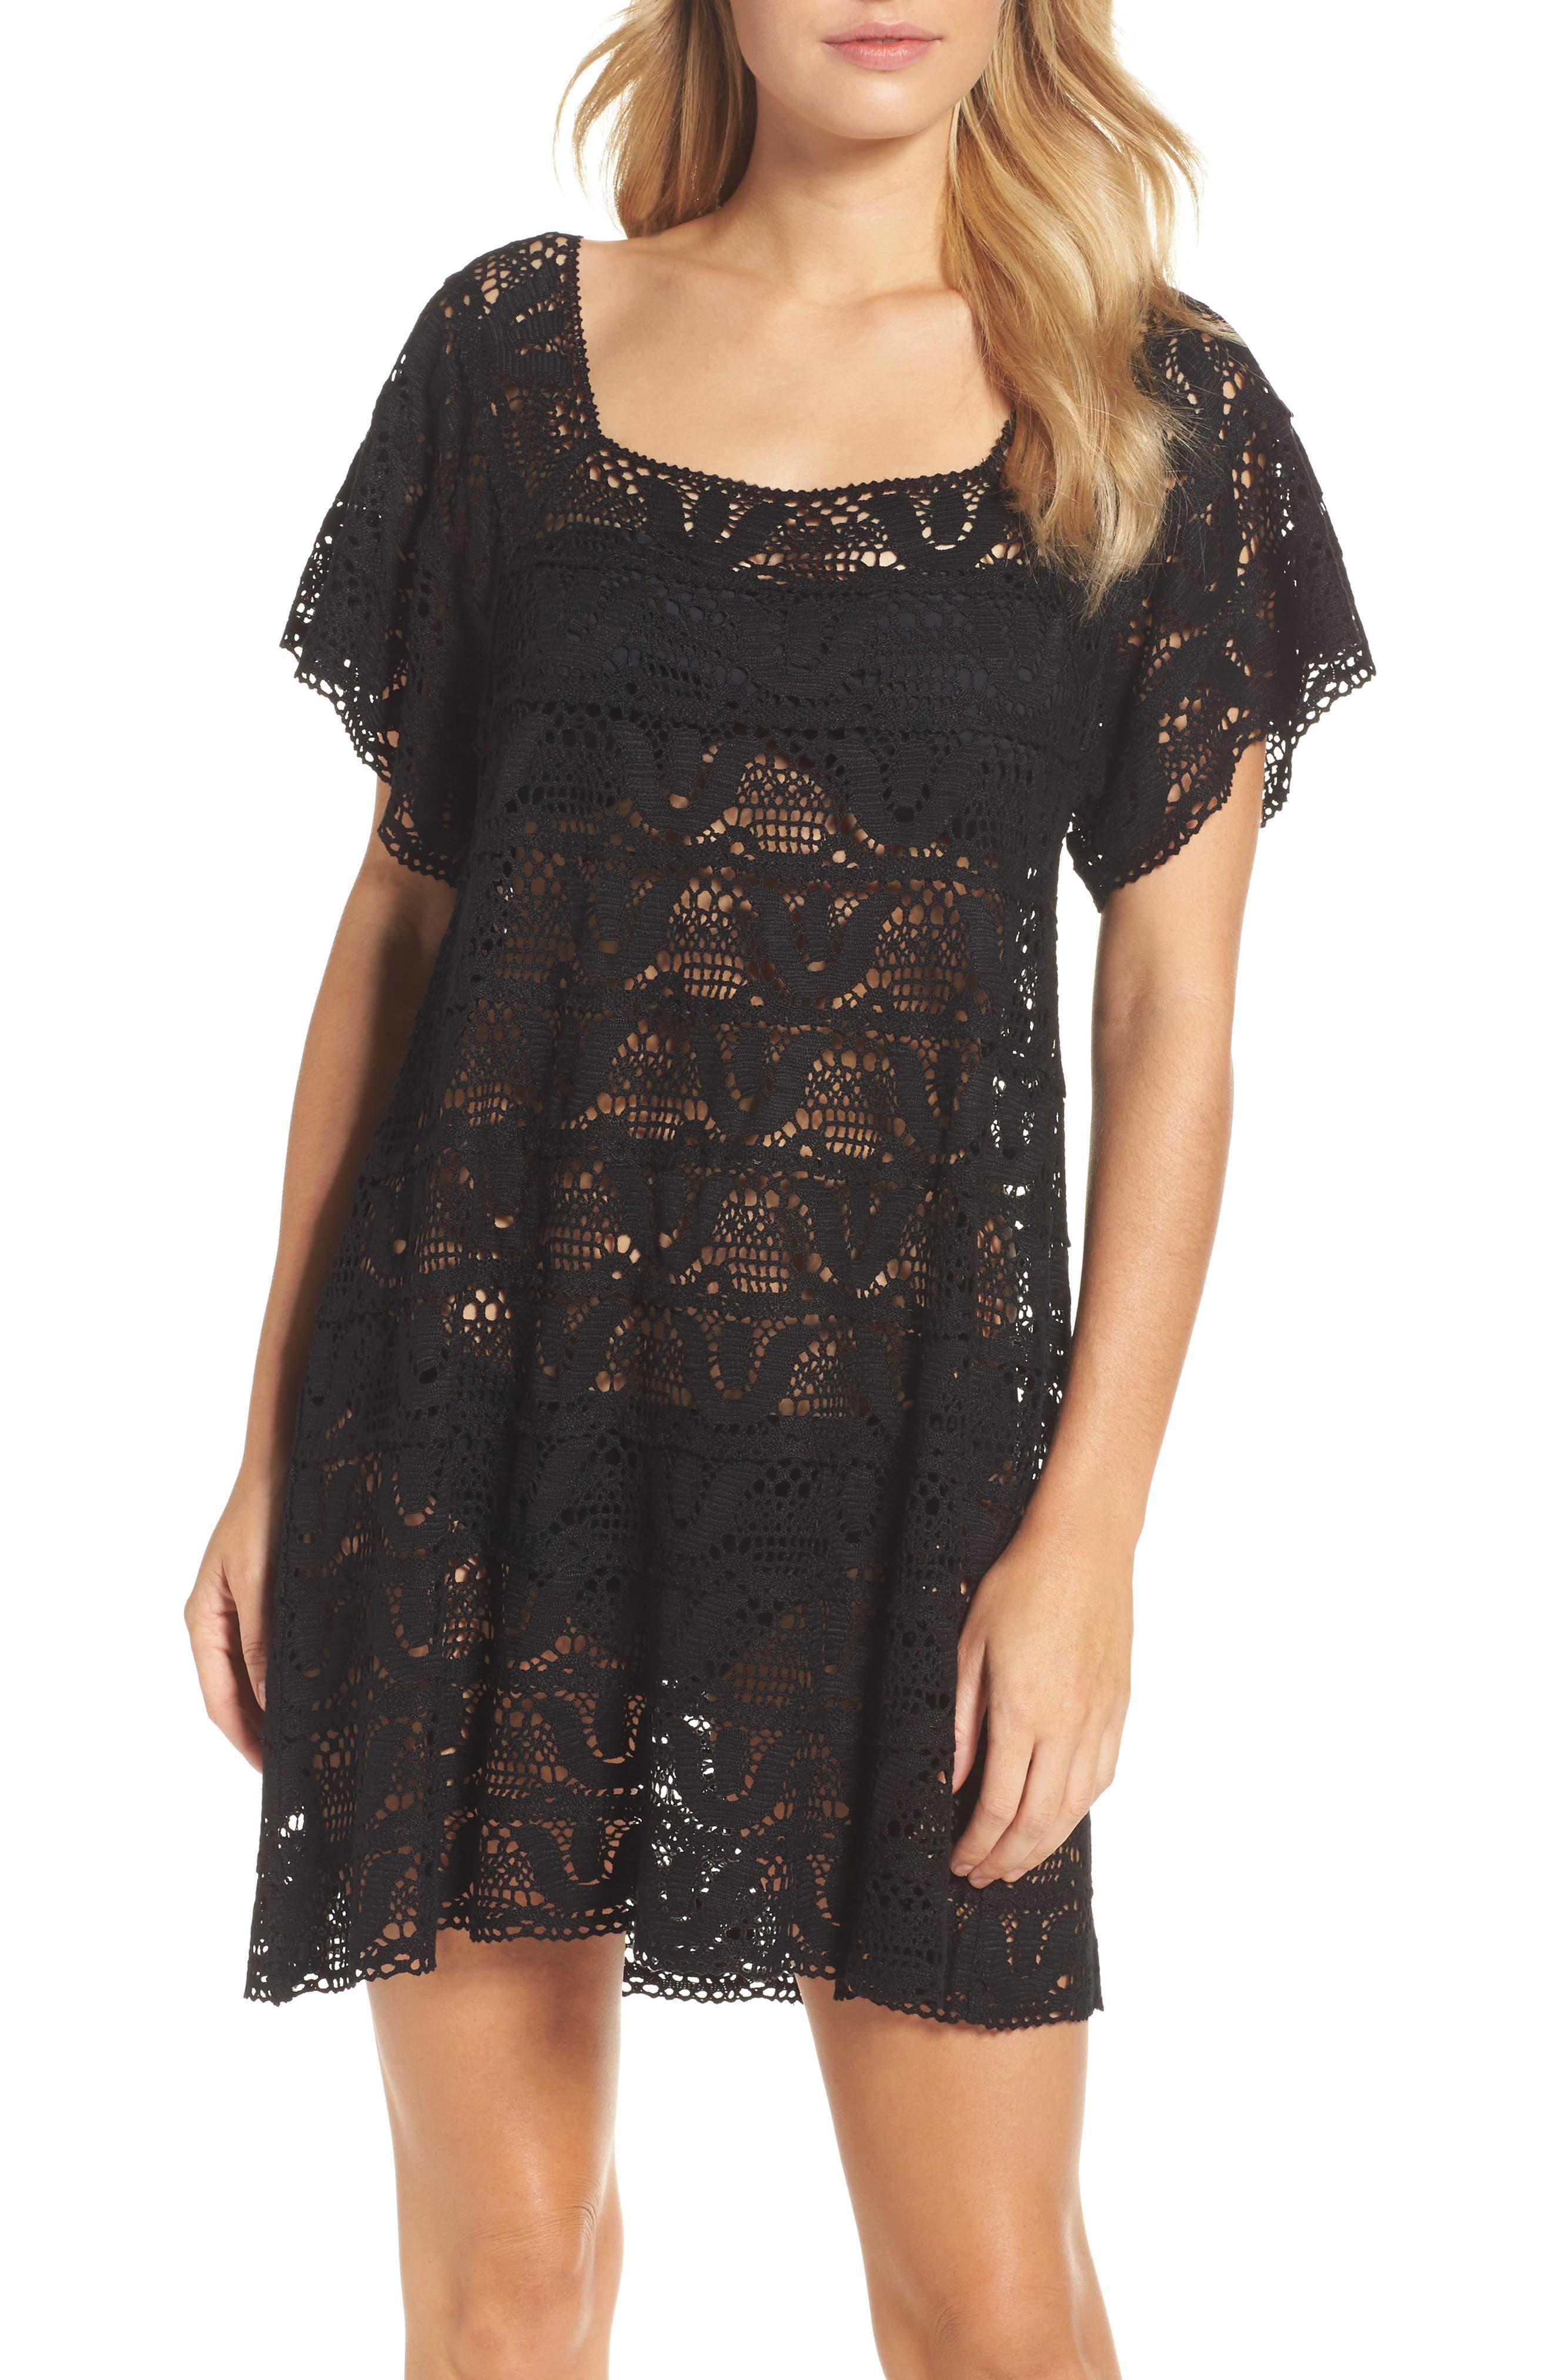 Nanette Lapore Crochet Cover-Up Dress,                             Main thumbnail 1, color,                             001